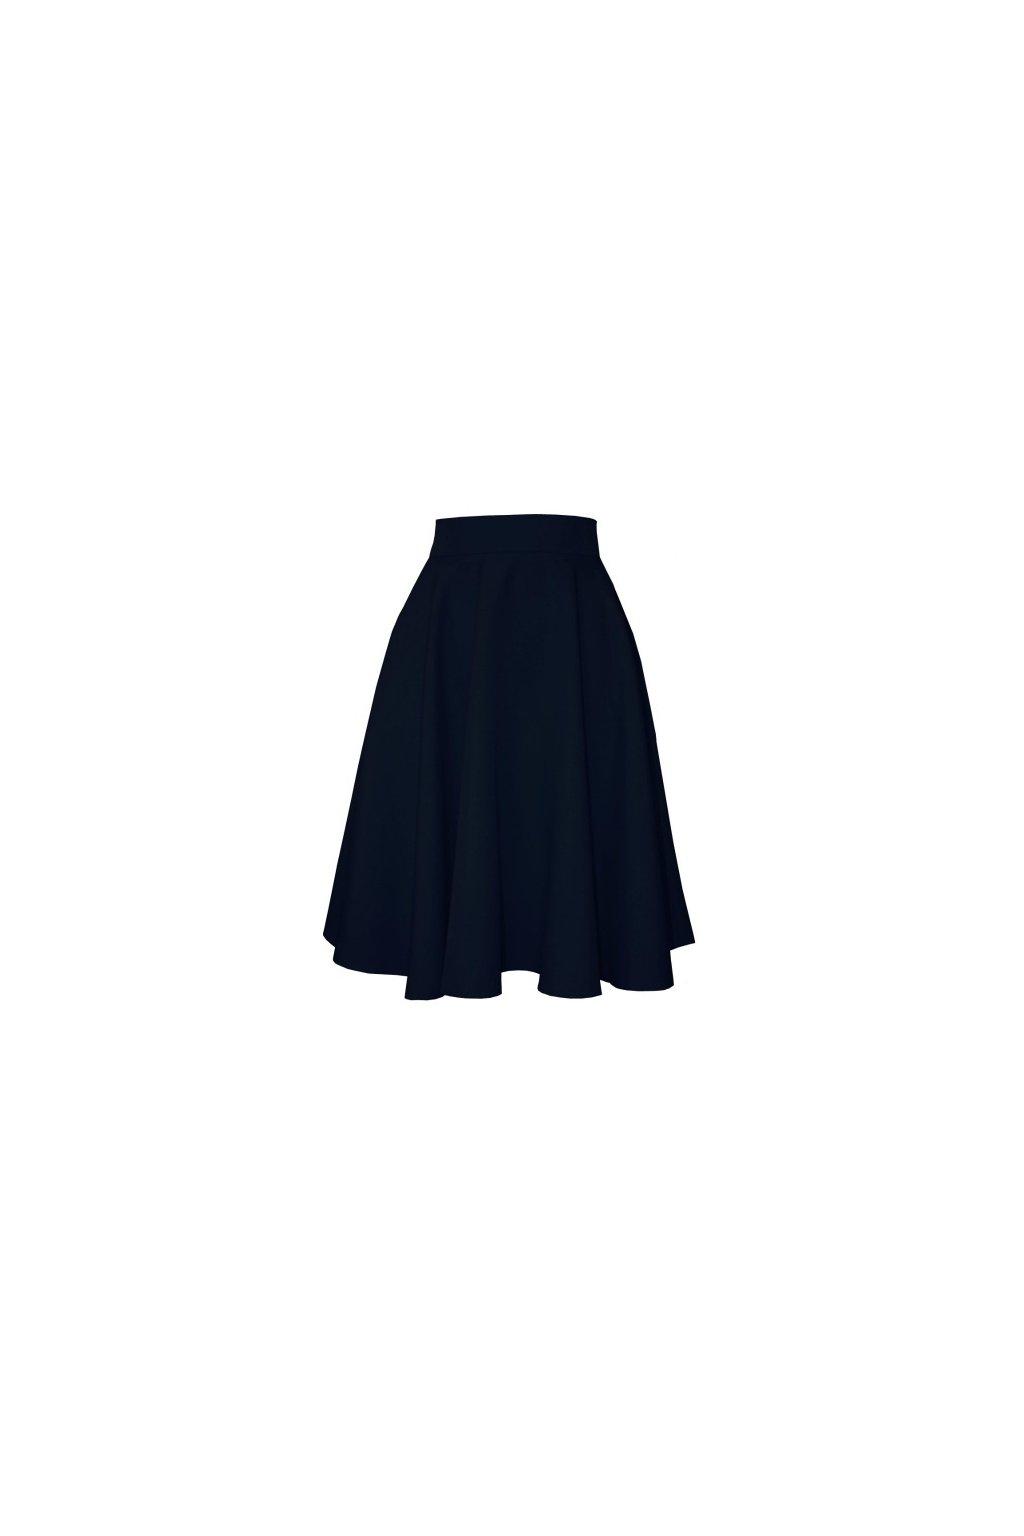 3ad18fa6d790 Áčková sukňa klasik čierna - Tentation.sk